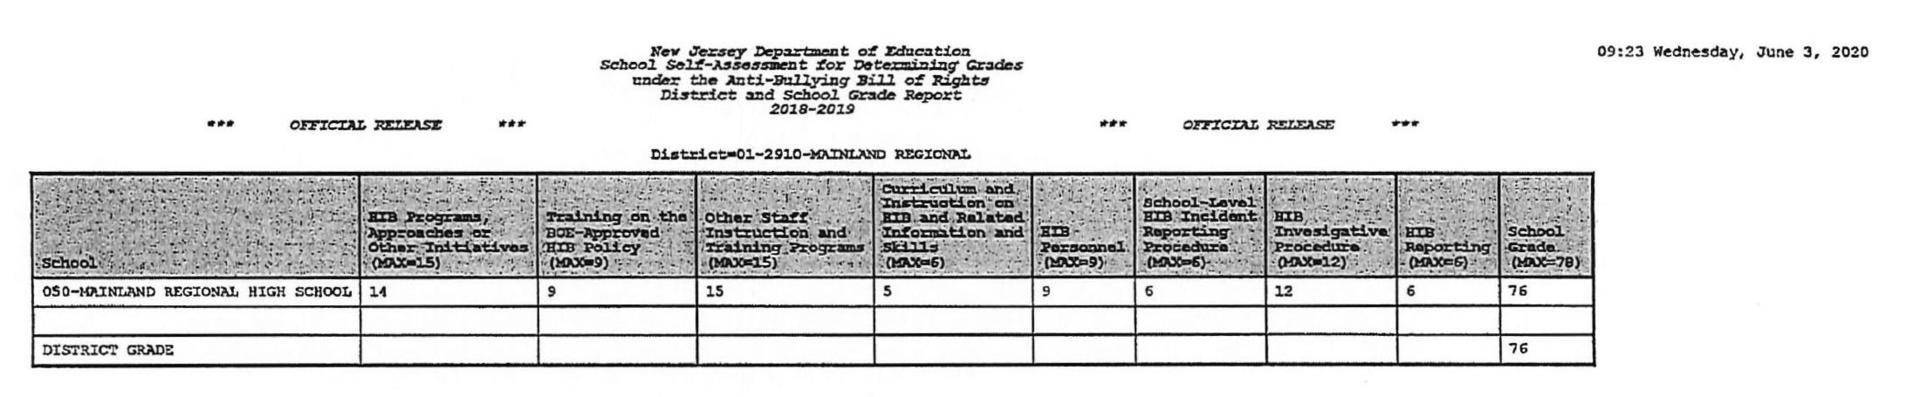 MRHS HIB Grade Report chart